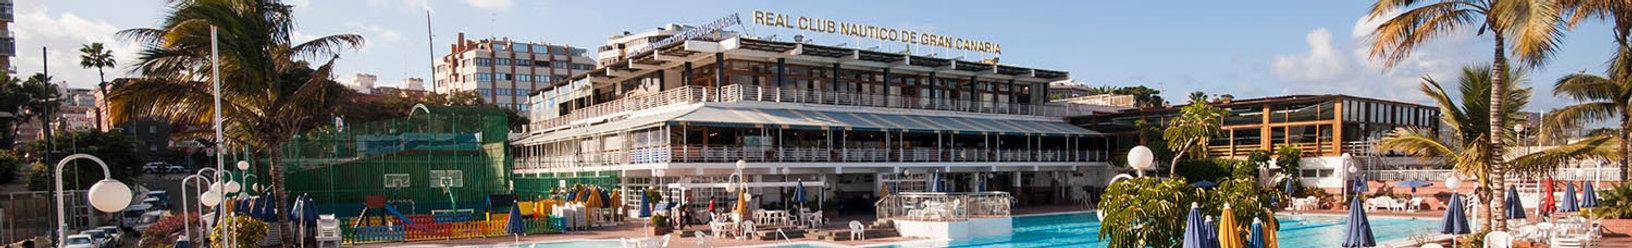 Banner_Edificio_Club.jpg